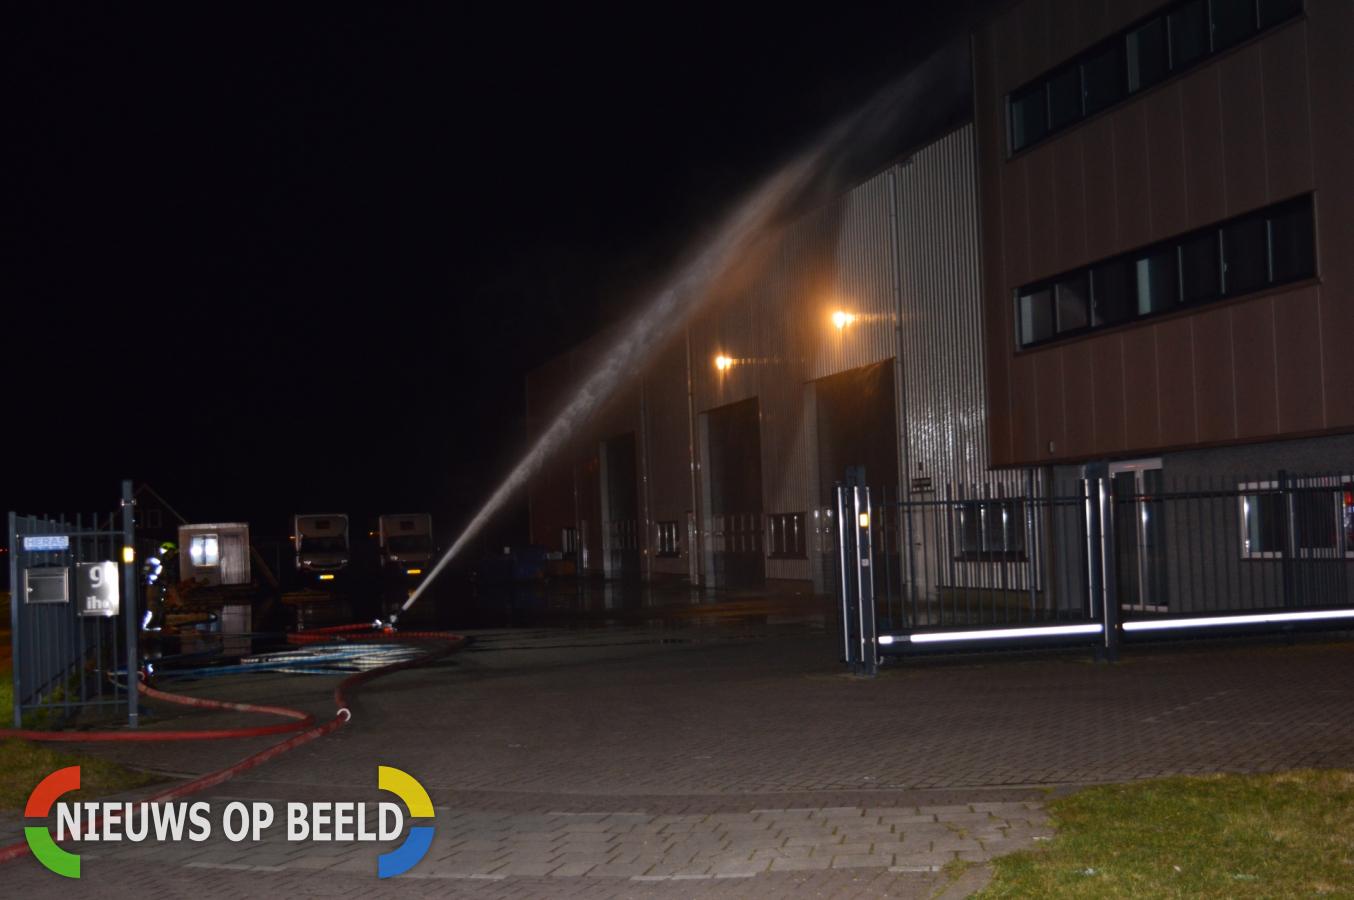 Zeer grote brand in houtverwerkingsbedrijf Energiebaan Oude-Tonge